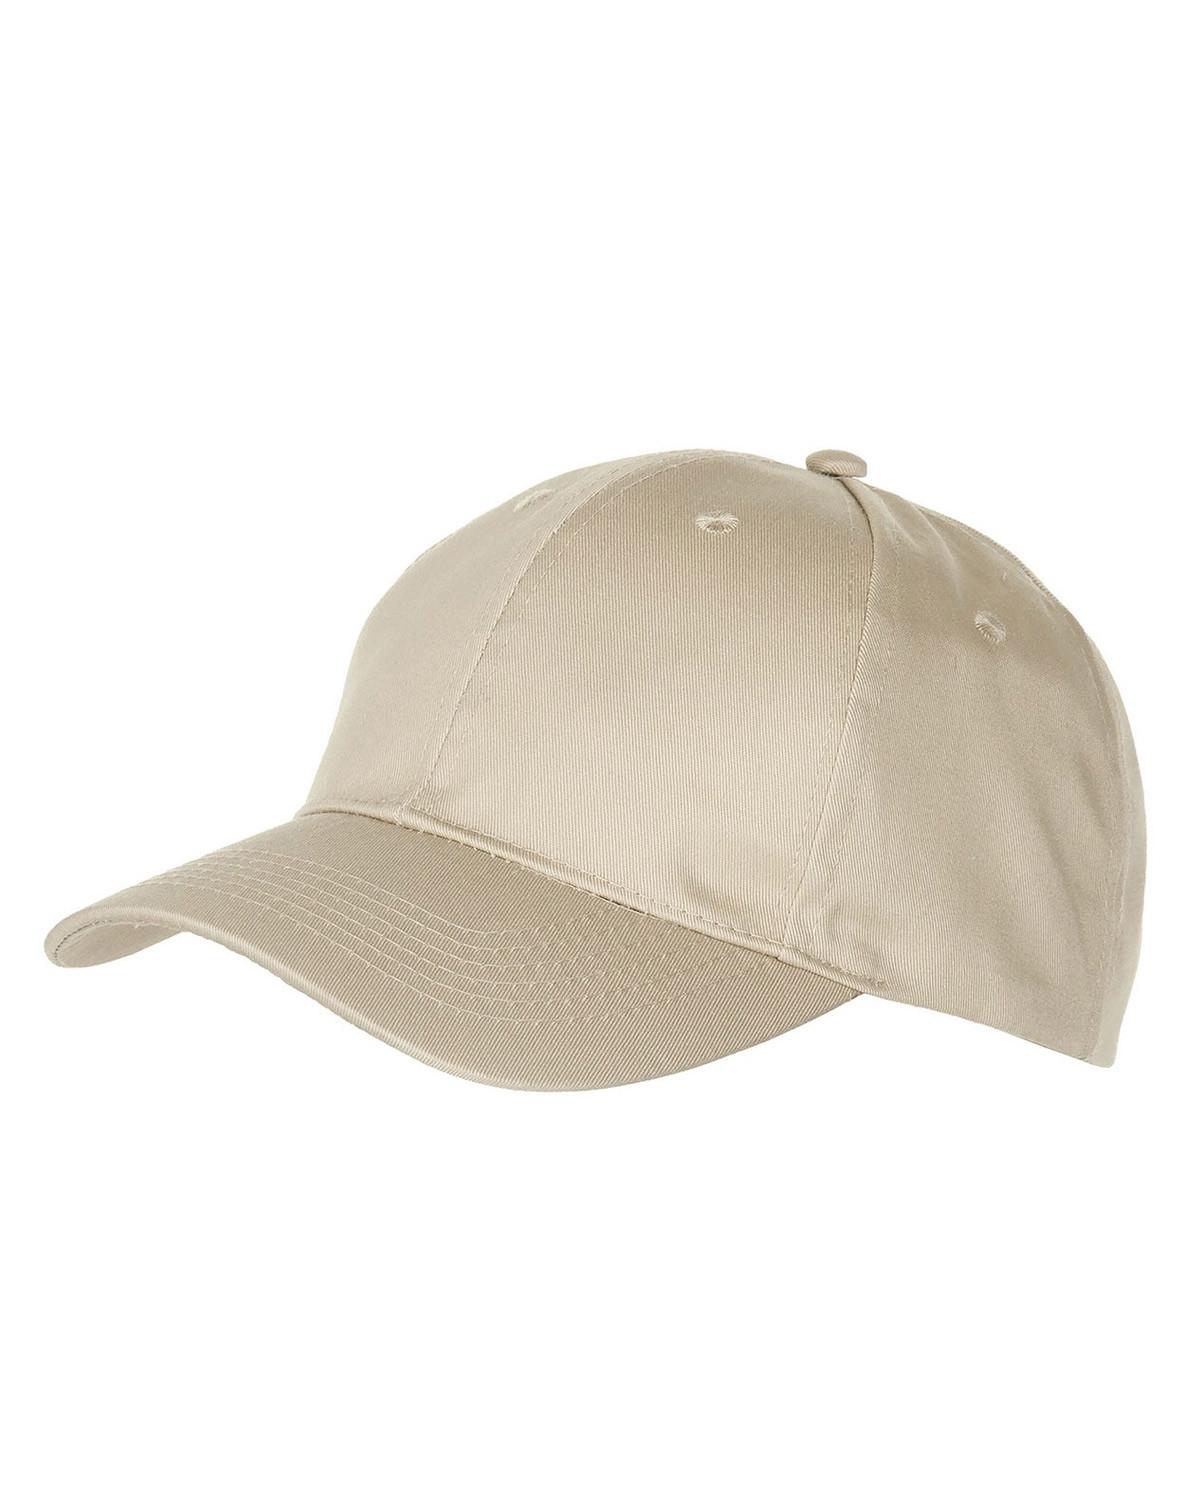 MFH Baseball Cap (Khaki, One Size)